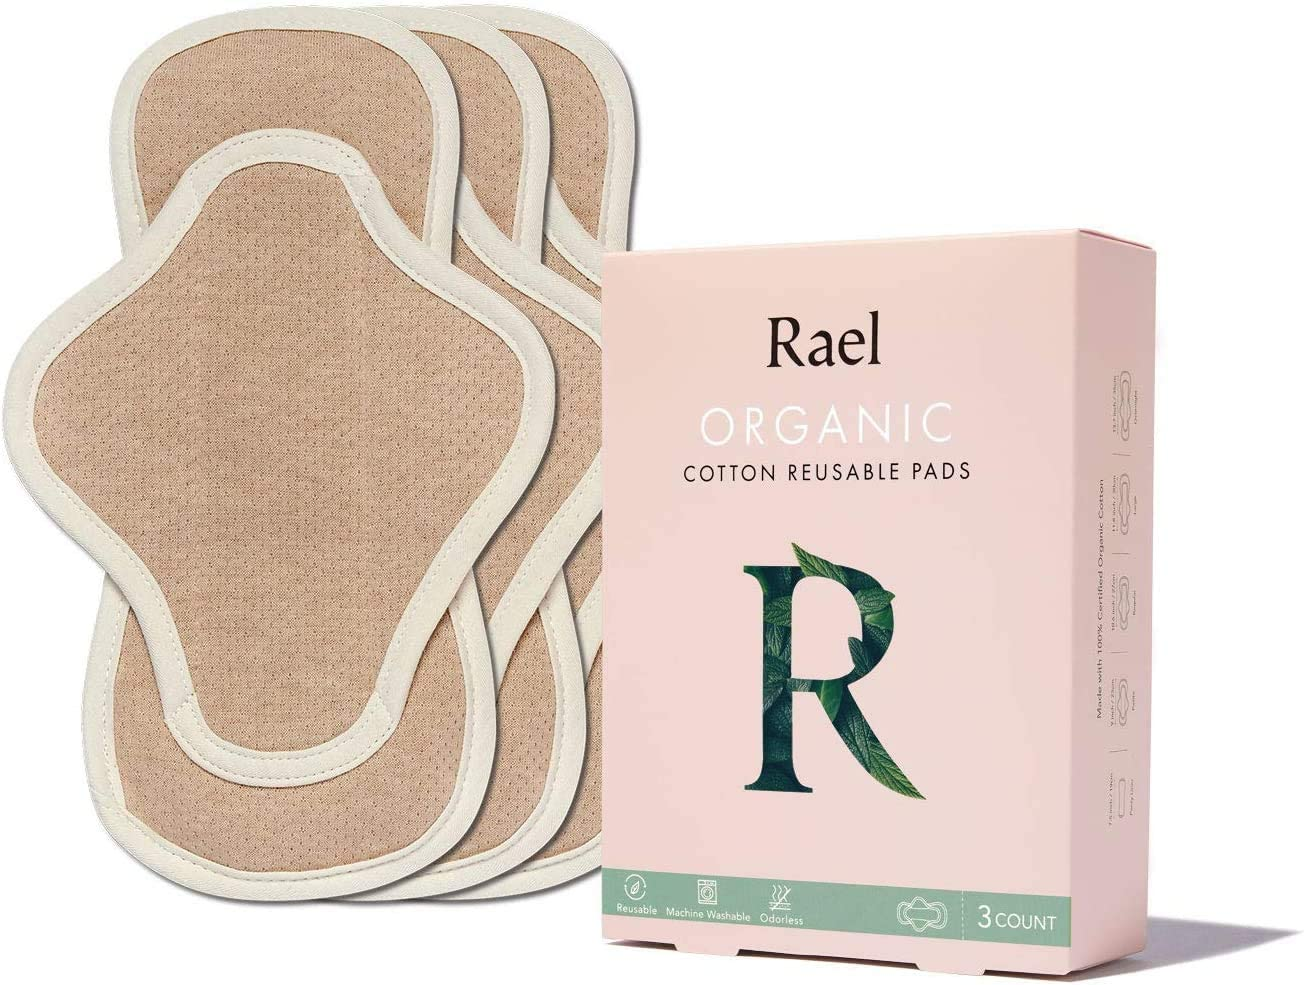 Hesta Organic Cotton PMS Relief Paño reutilizable Menstrual Sanitario 3 Almohadillas (Ala/Marrón, Delgado)